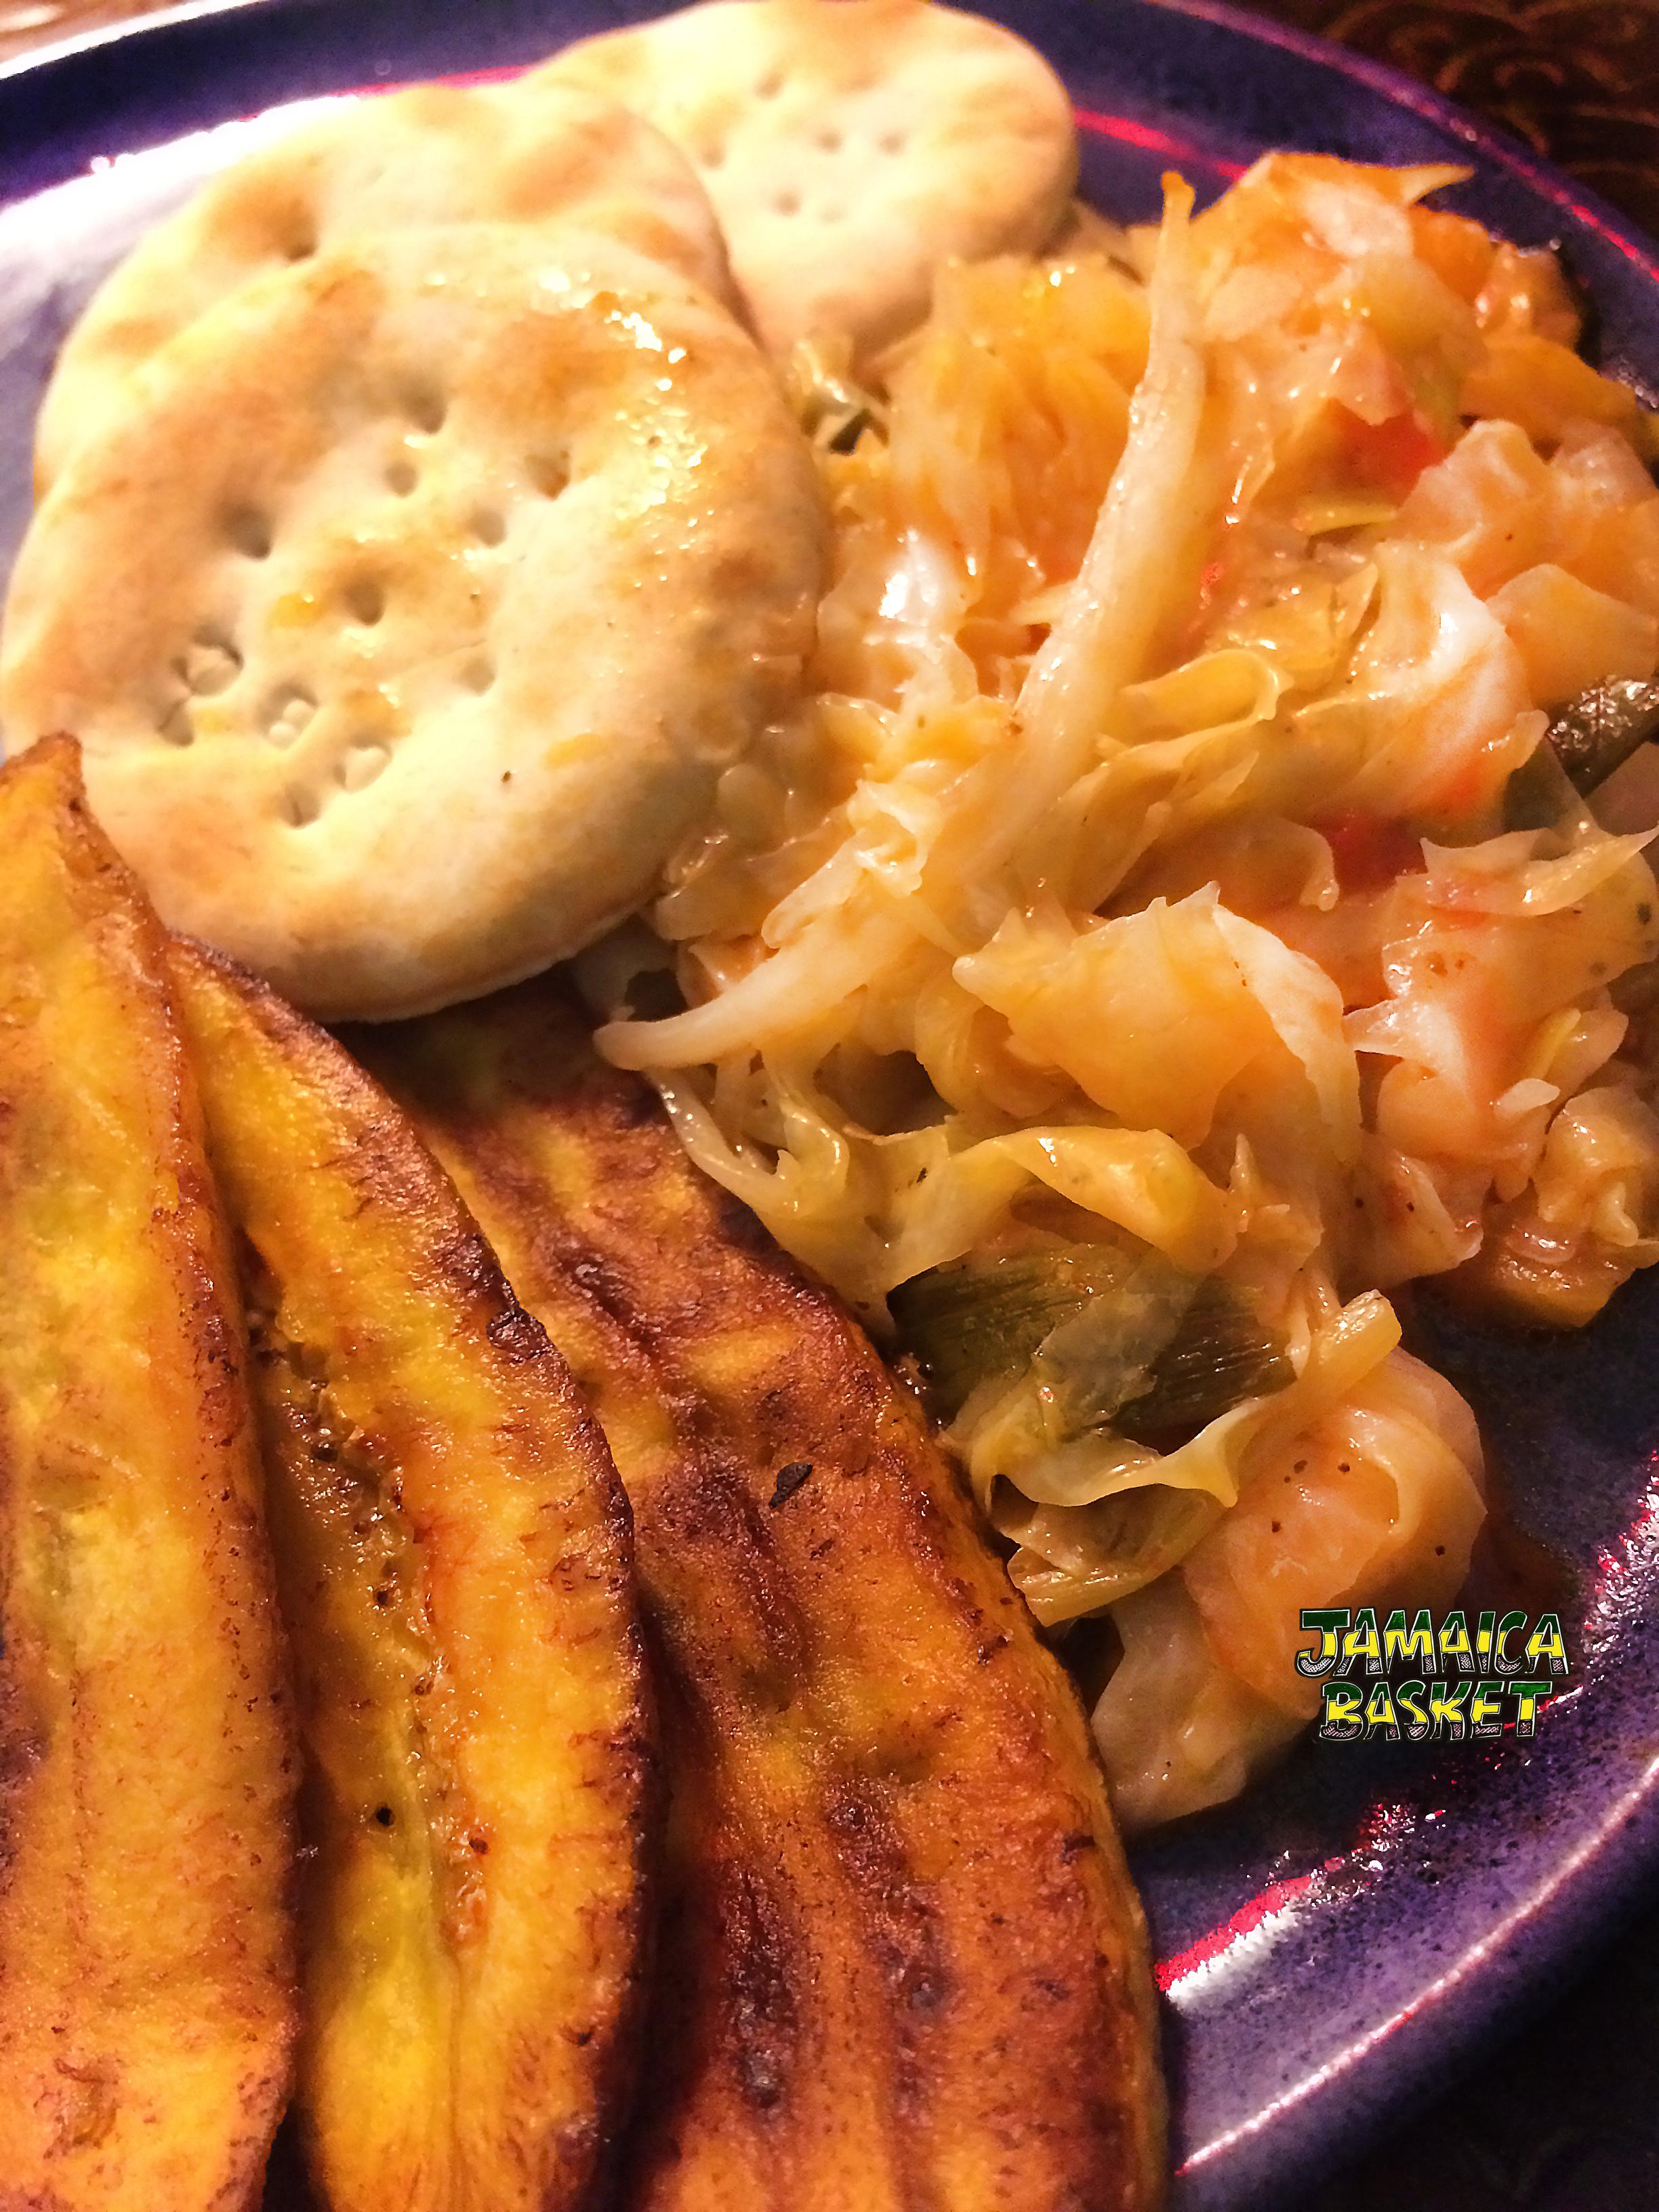 Jamaica Basket cabbage plantian